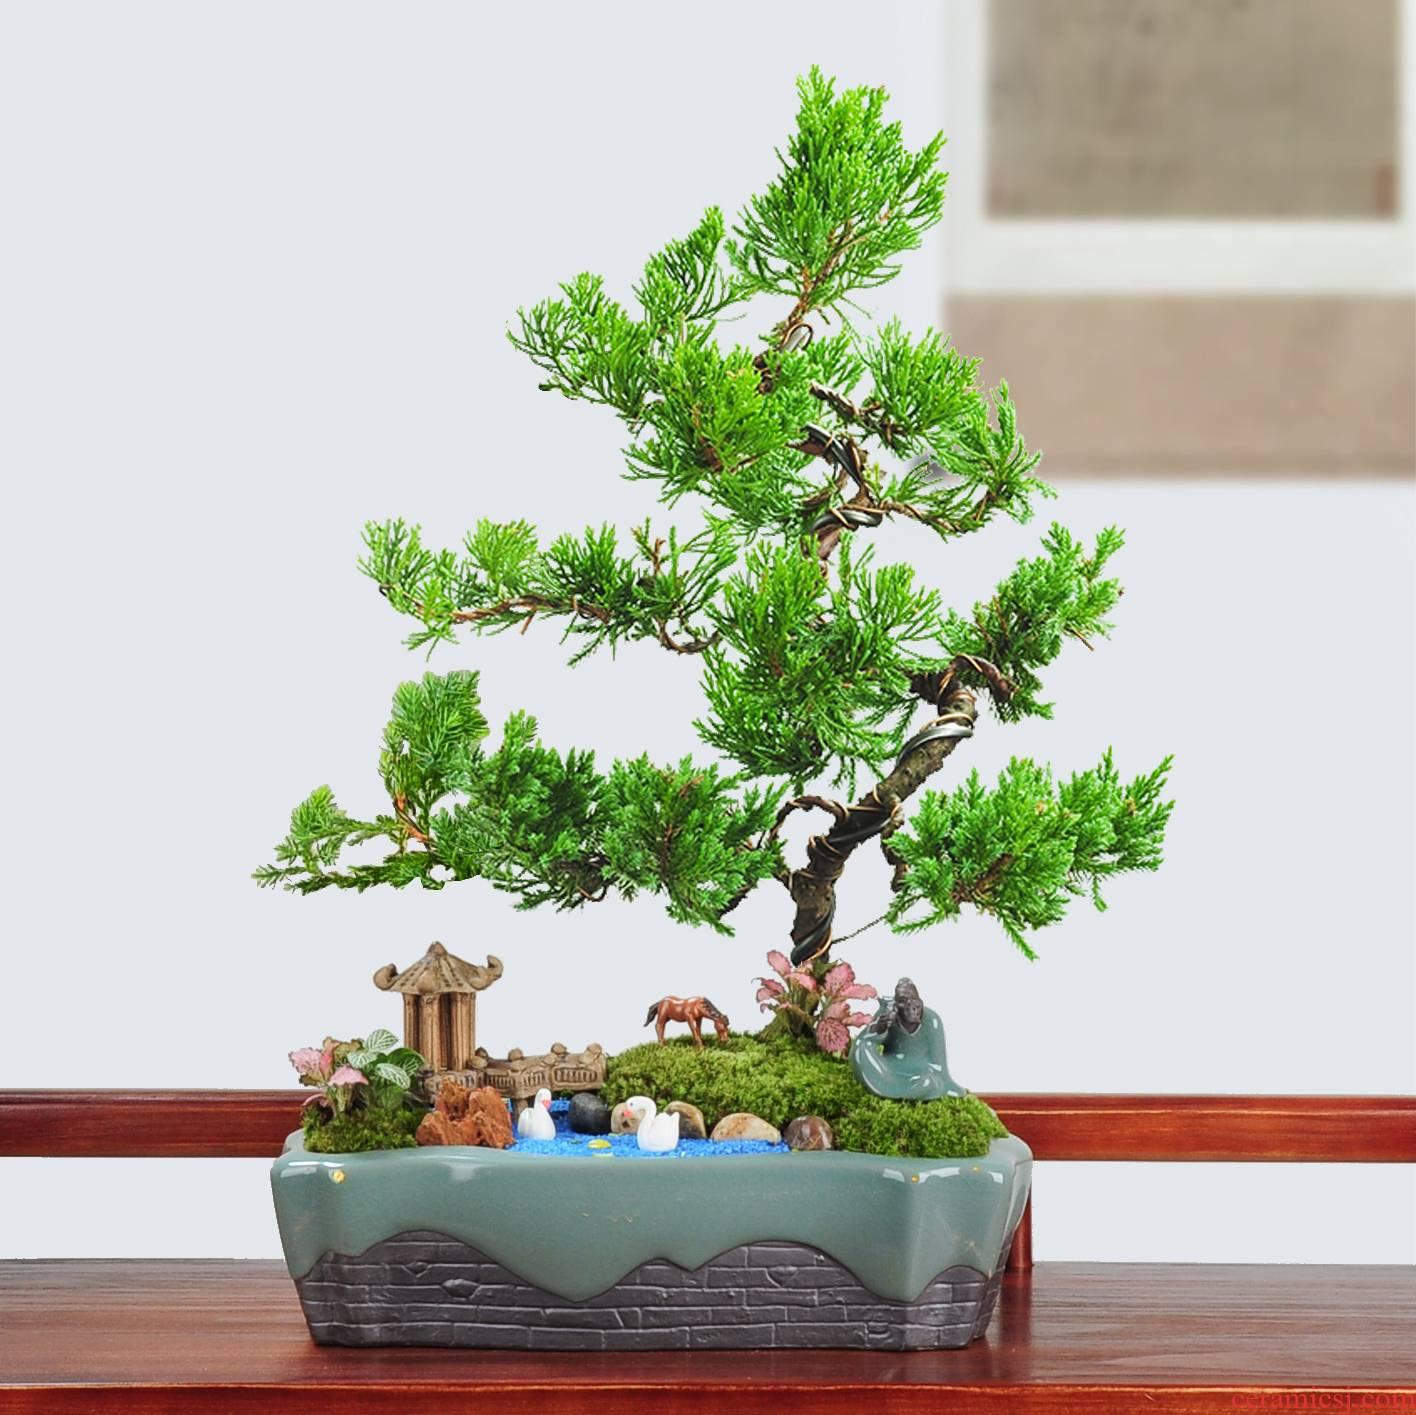 The elder brother of The ceramic up with breathable soil micro landscape large flower pot new preferential elm banyan lobular rosewood DIY landscape